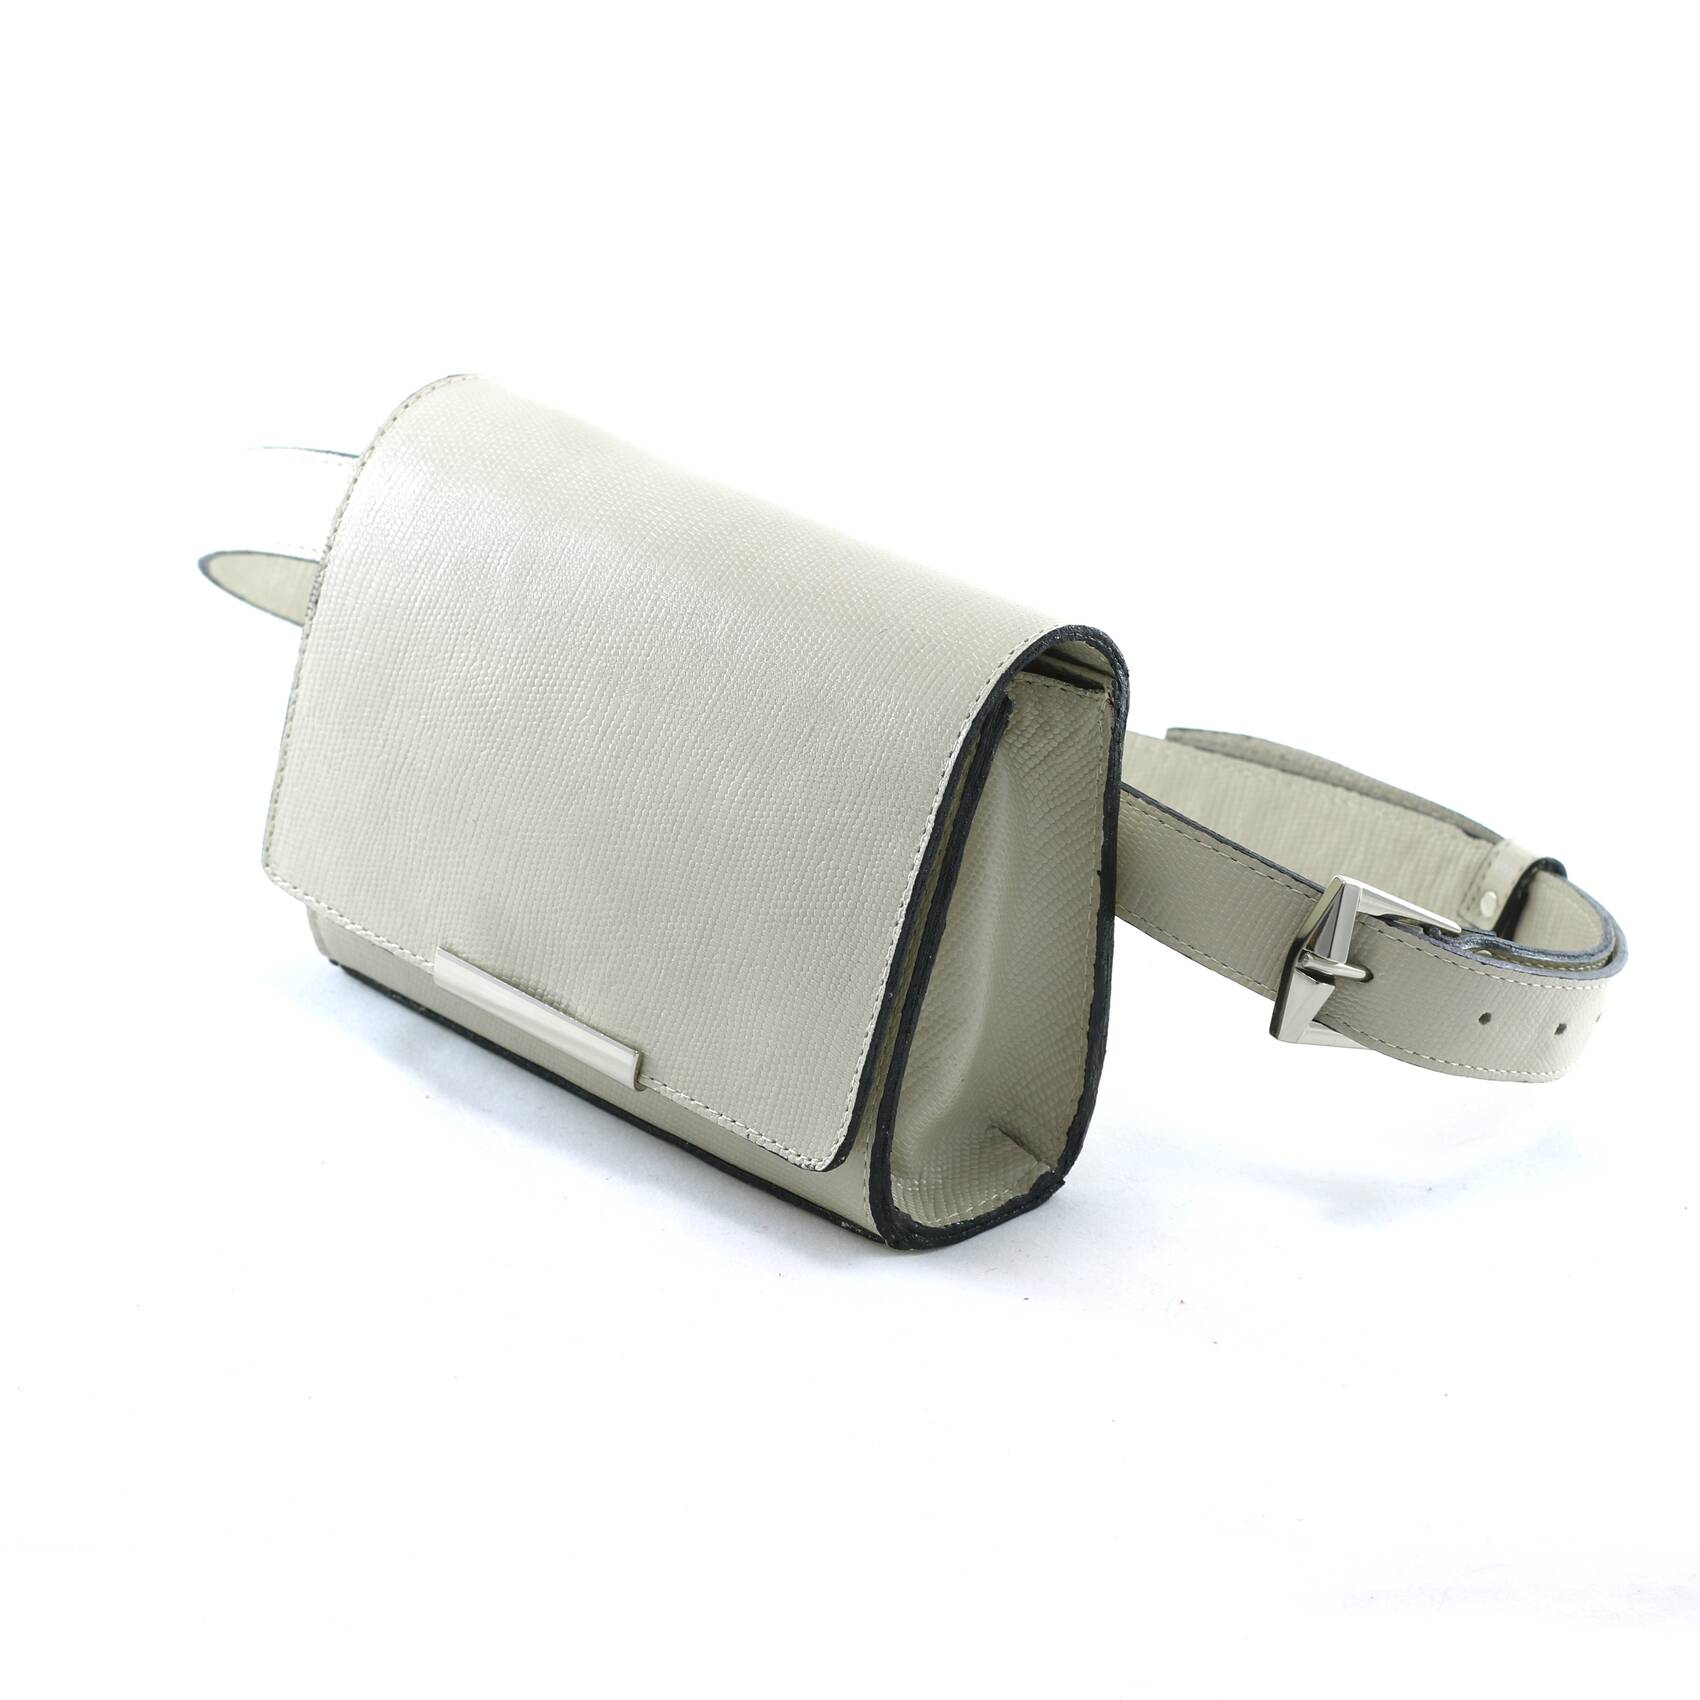 MONACO Bolsa pochete clutch com corrente off white